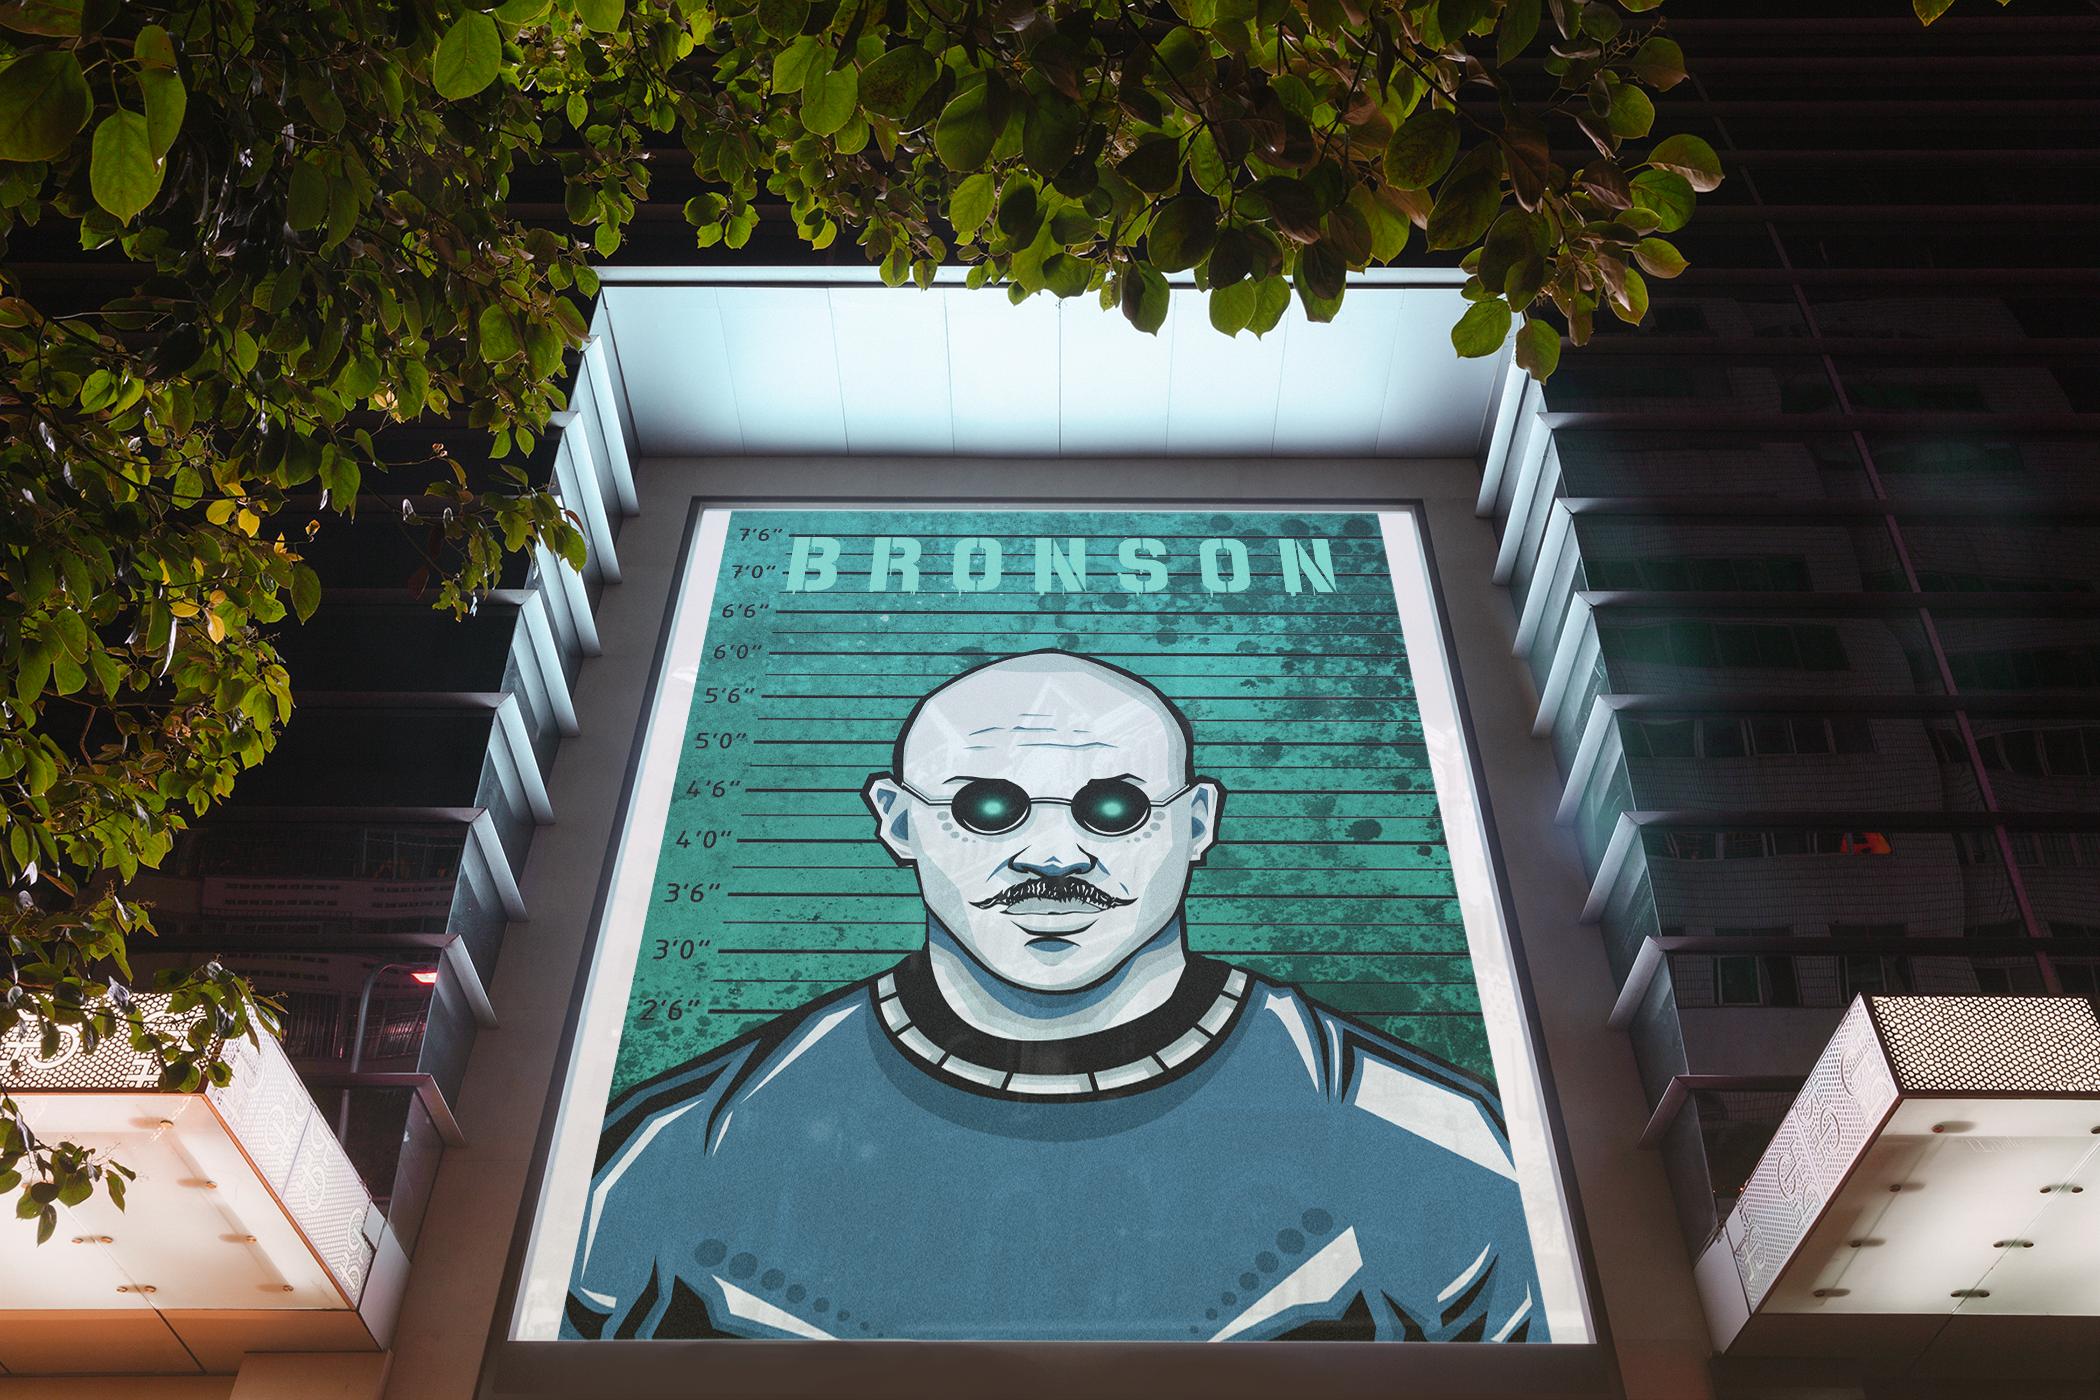 Mockup of Bronson poster.